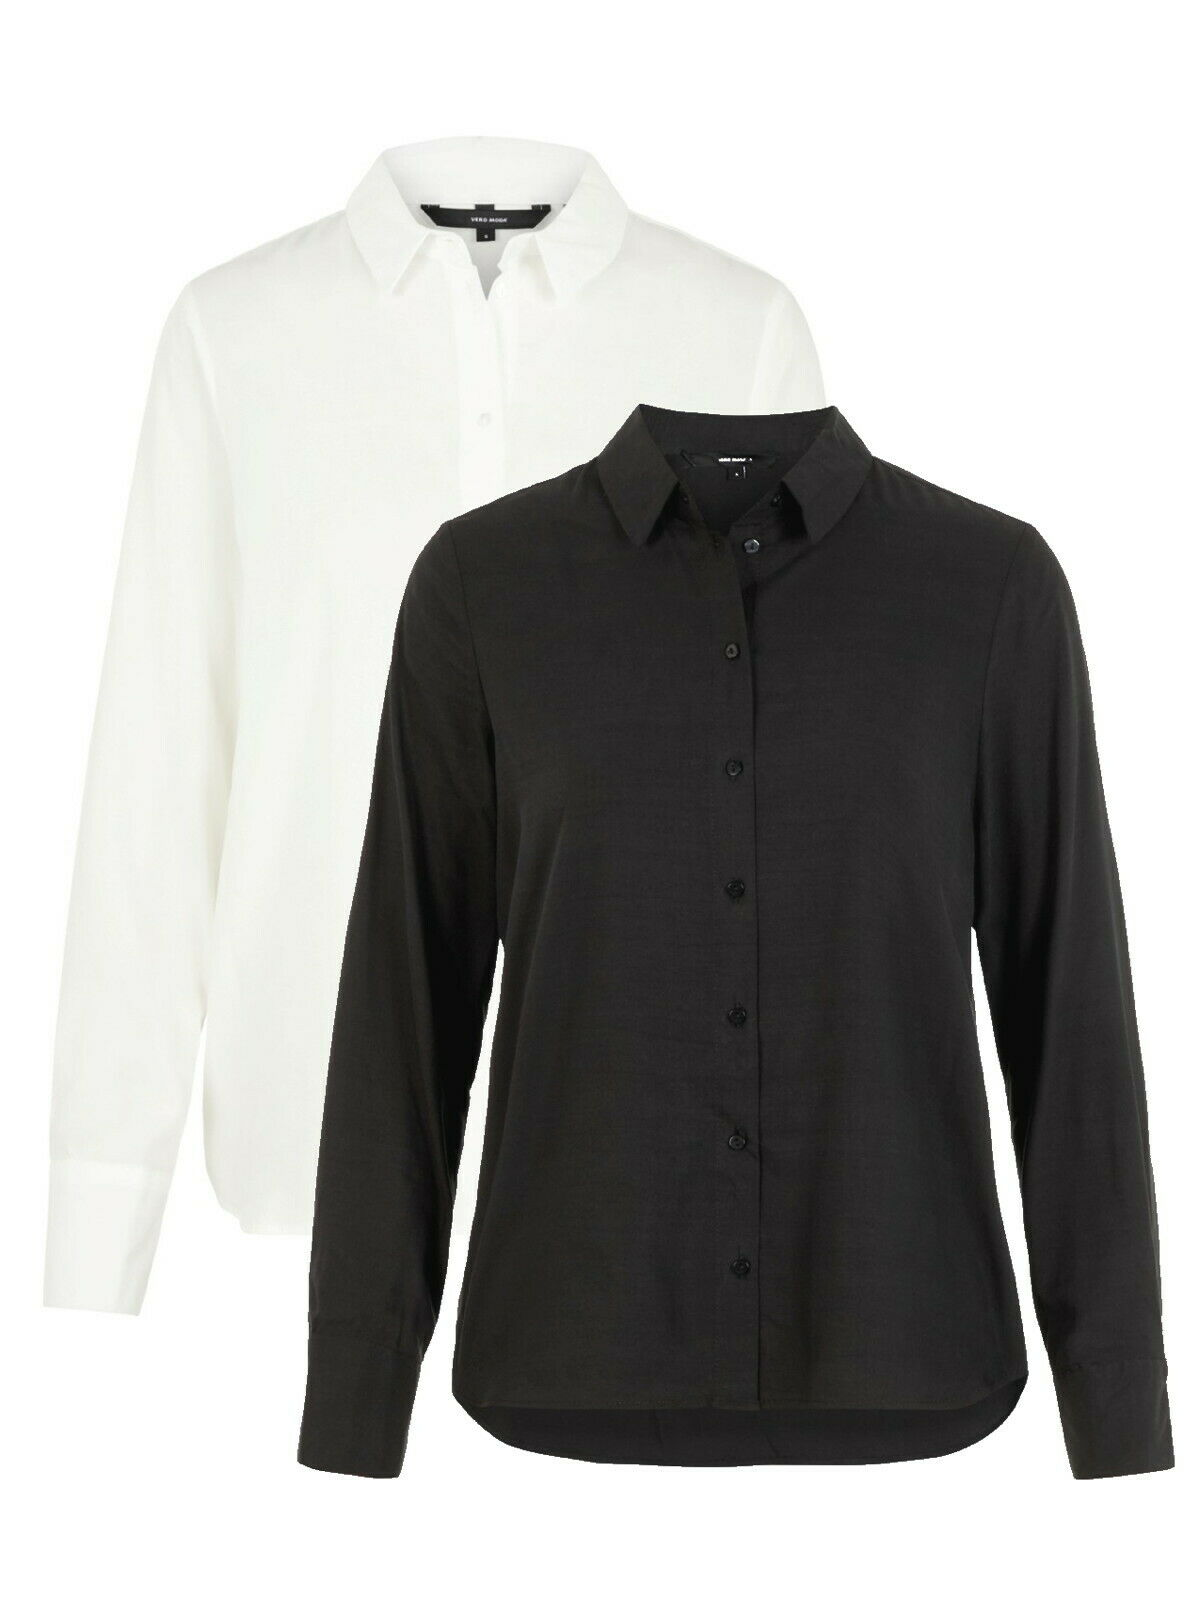 Vero Moda Damen Bluse VmTanya 10218724 schwarz weiss XS S M L XL